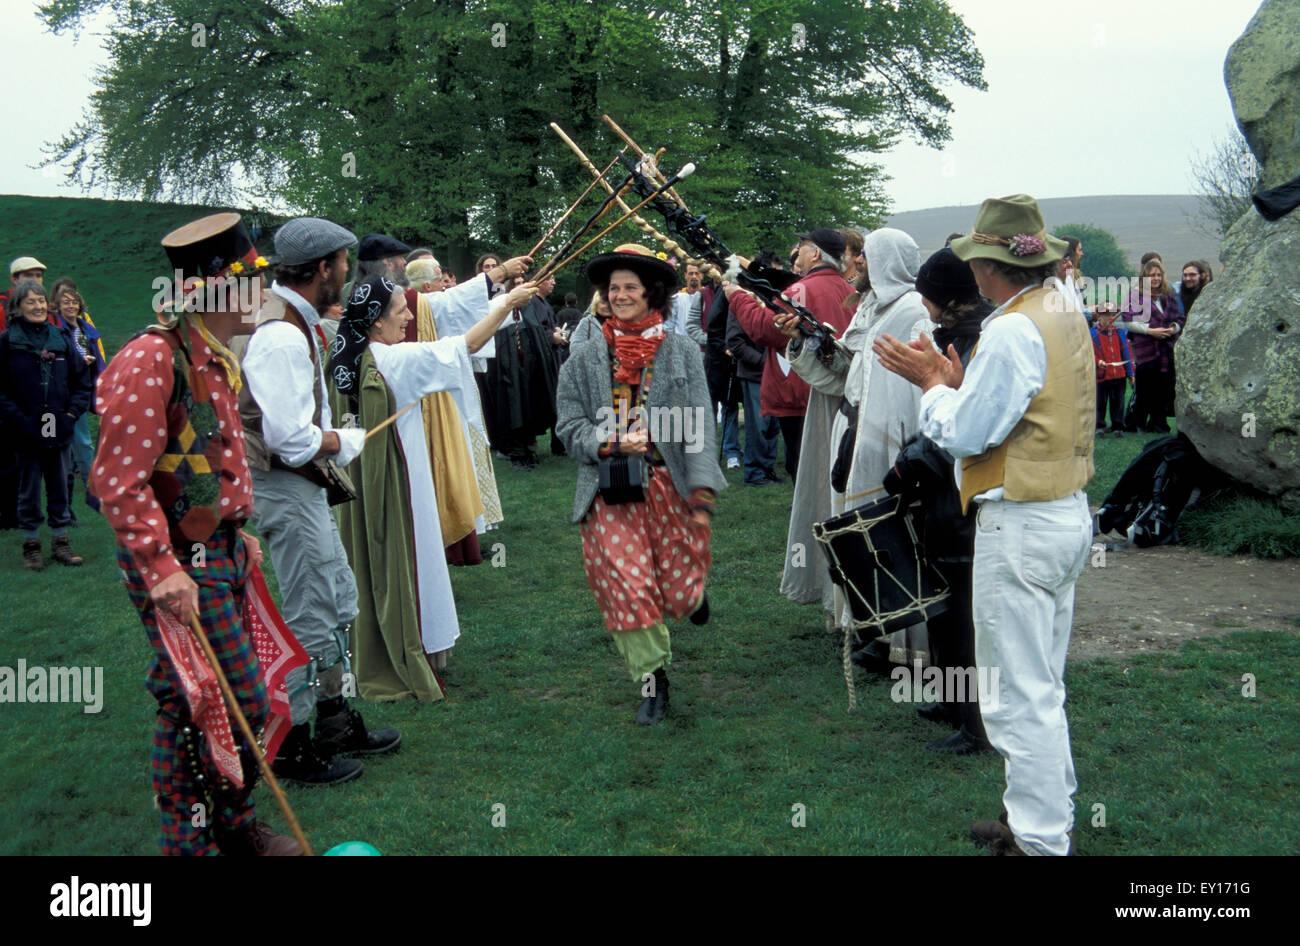 Pagan hand fasting ceremony Avebury Stone Circle Wiltshire - Stock Image